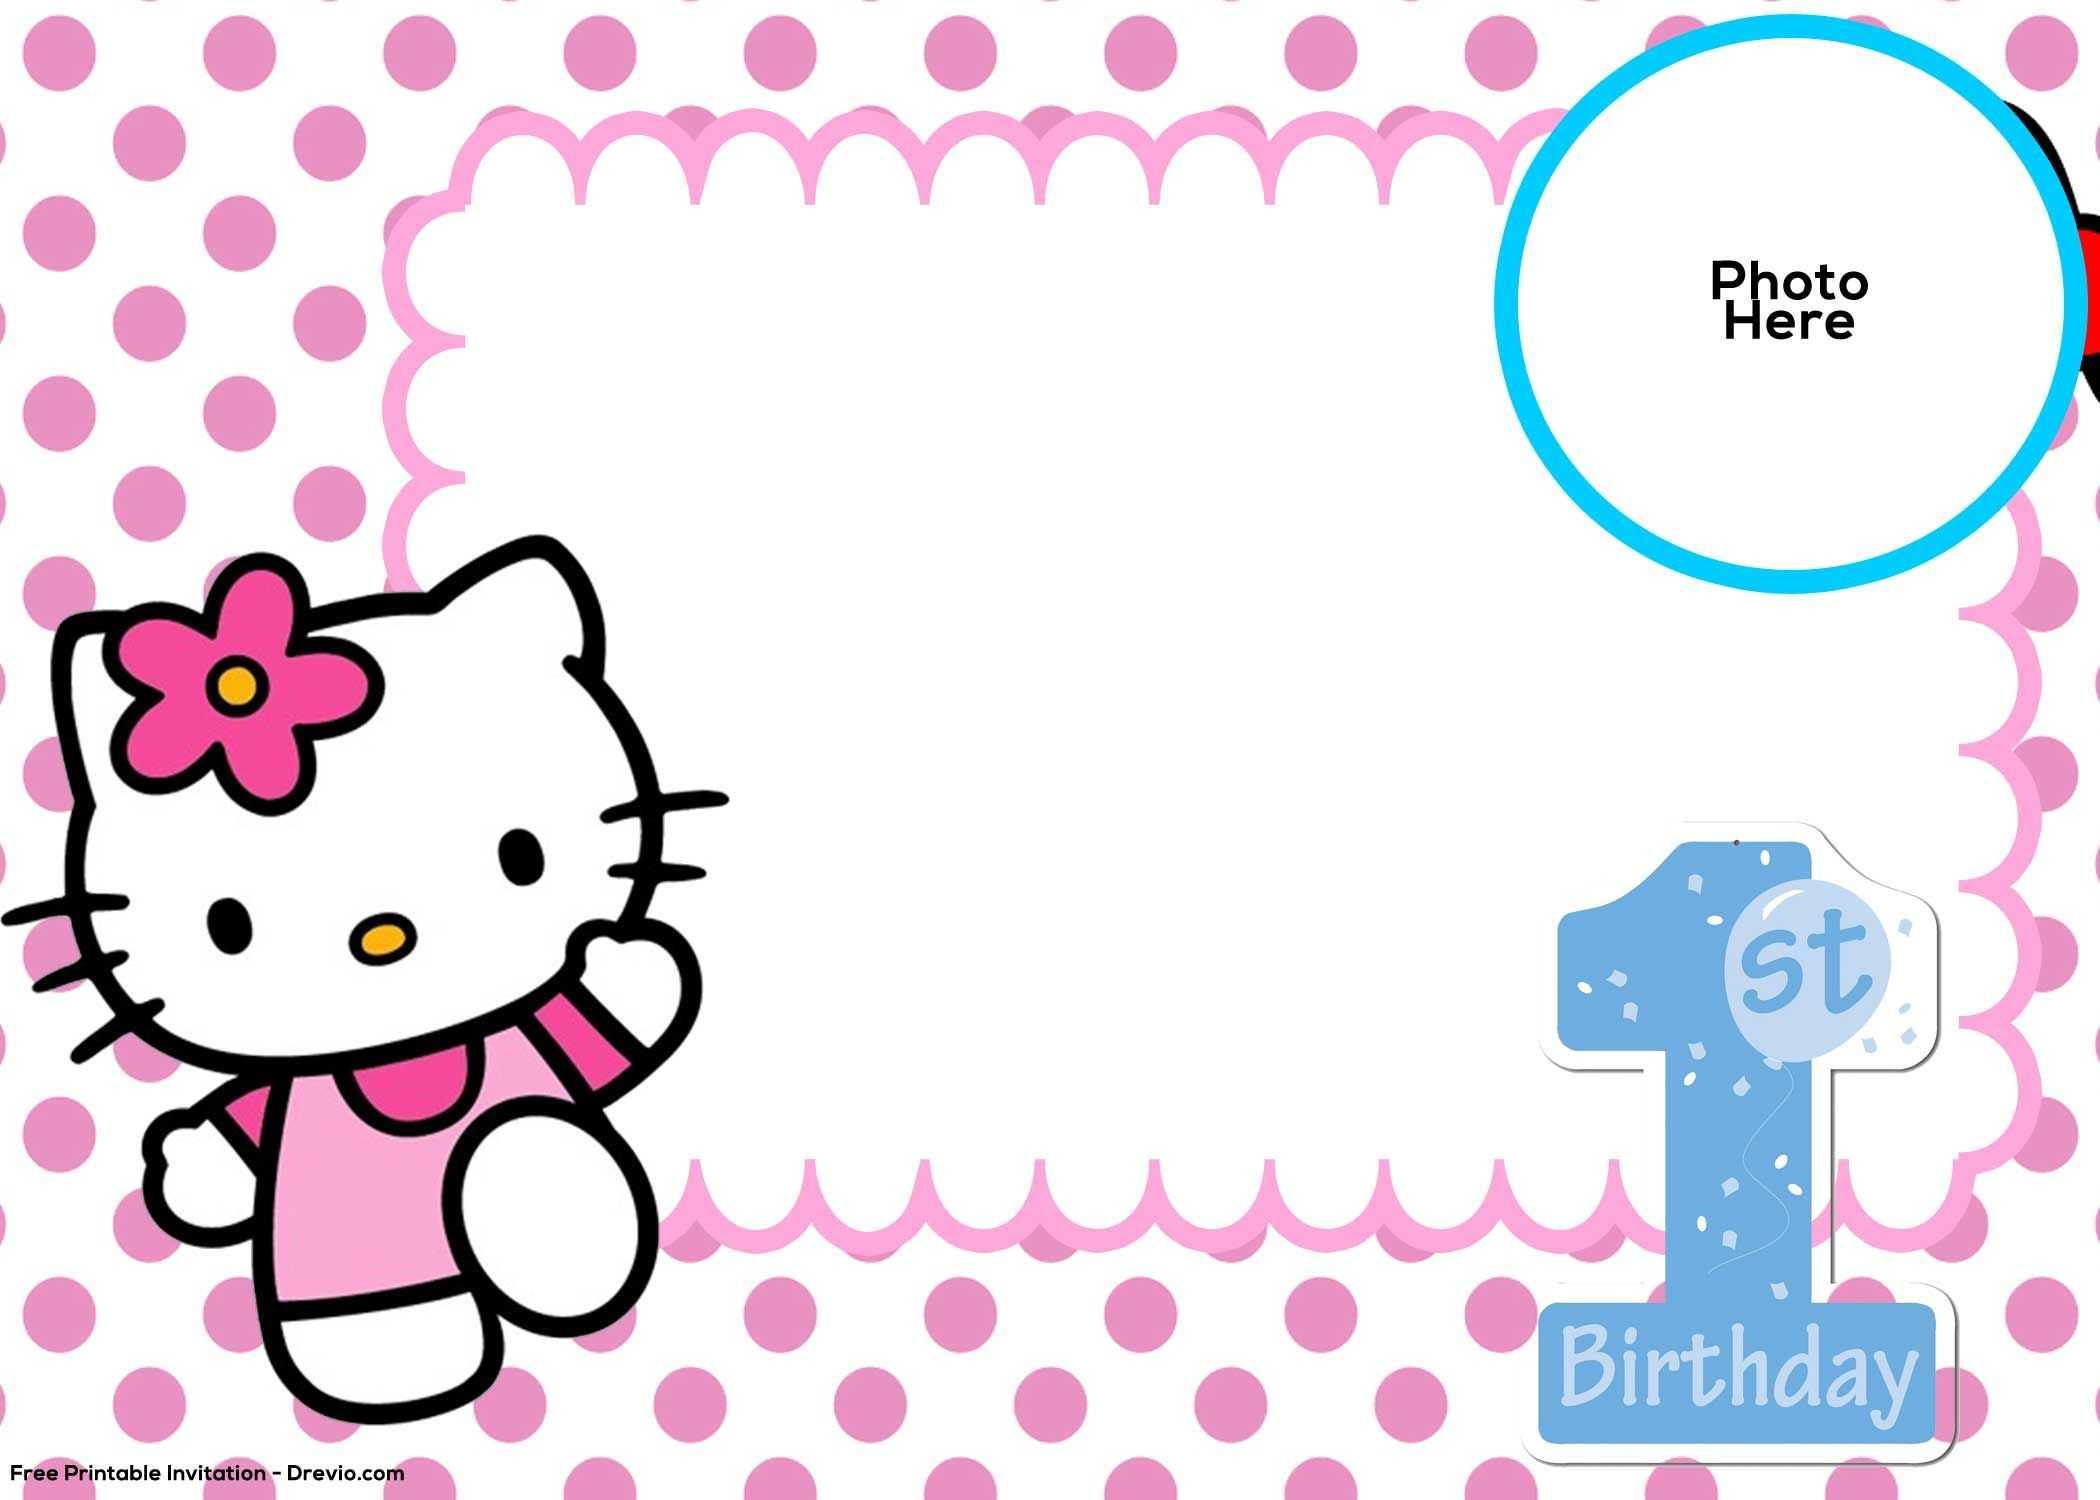 Free Hello Kitty 1St Birthday Invitation Template   Birthday Intended For Hello Kitty Birthday Banner Template Free